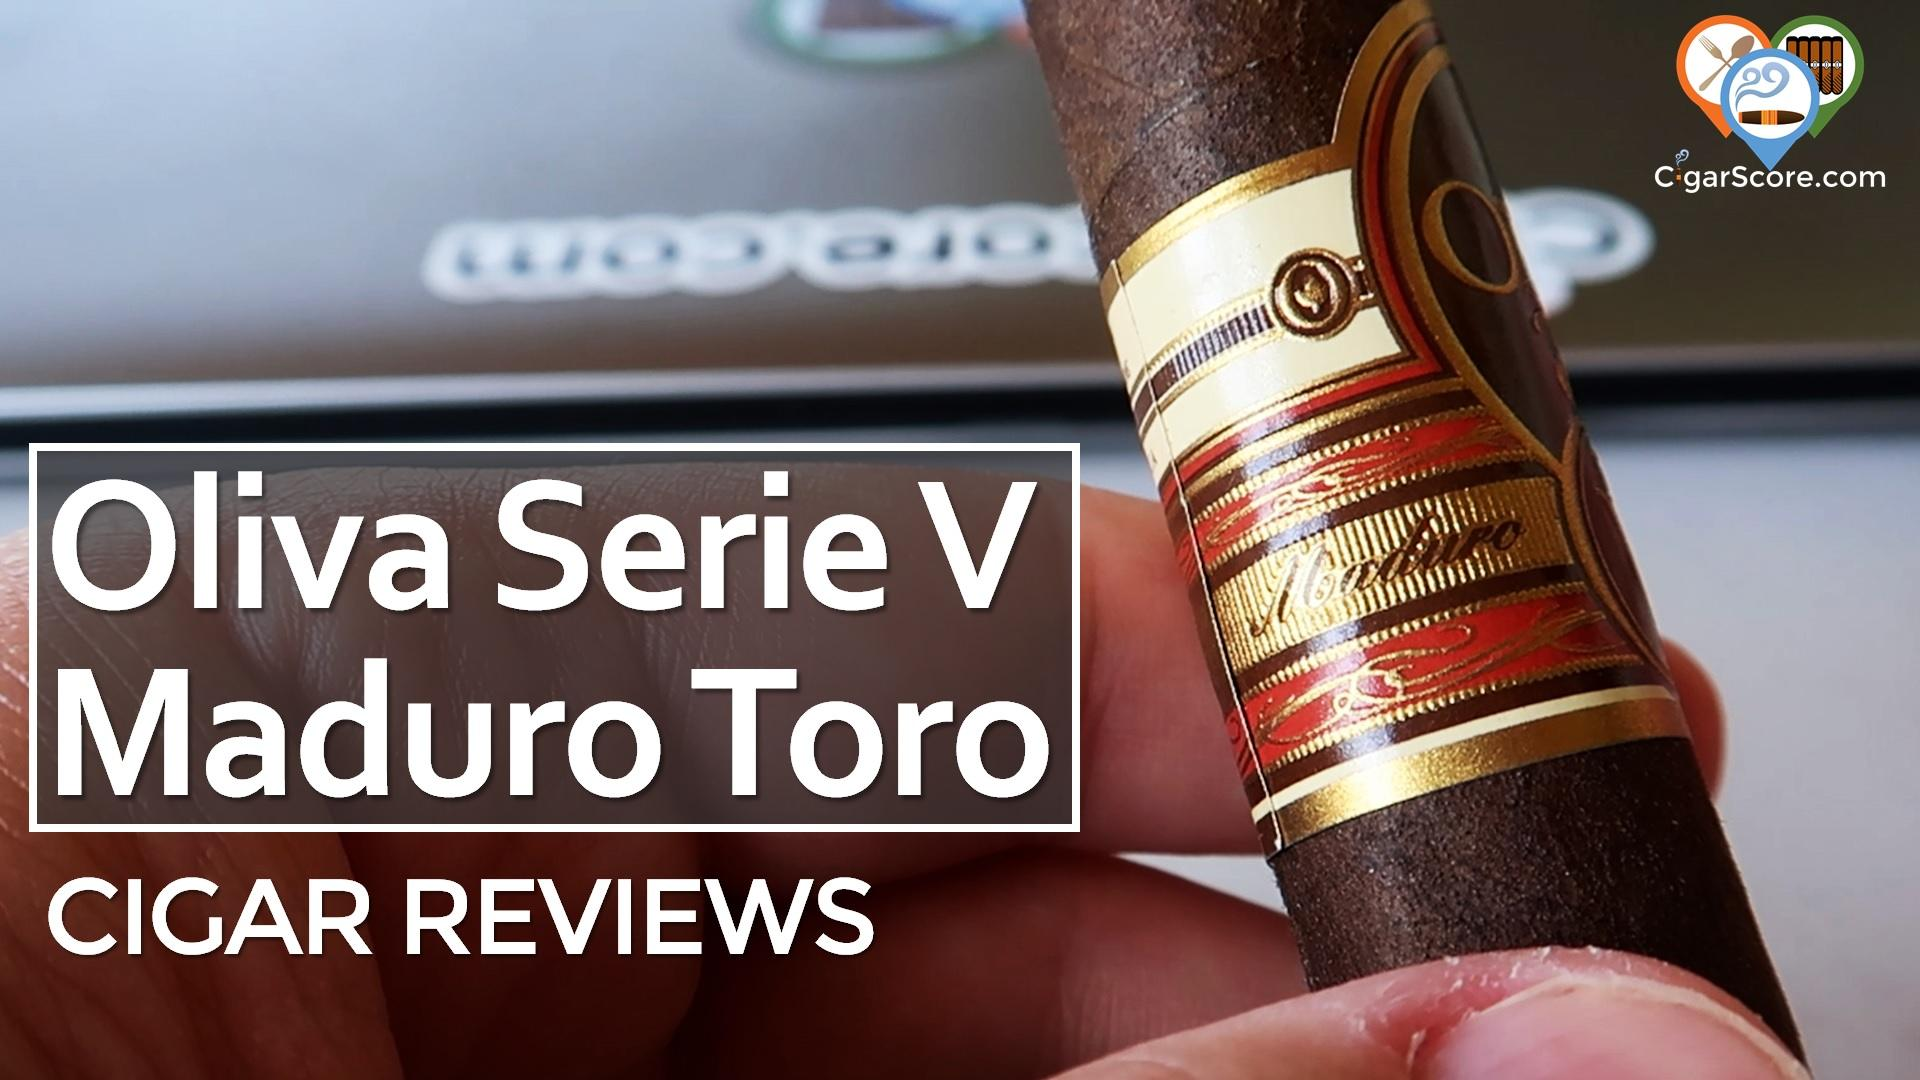 Cigar Review Oliva Serie V Maduro Toro